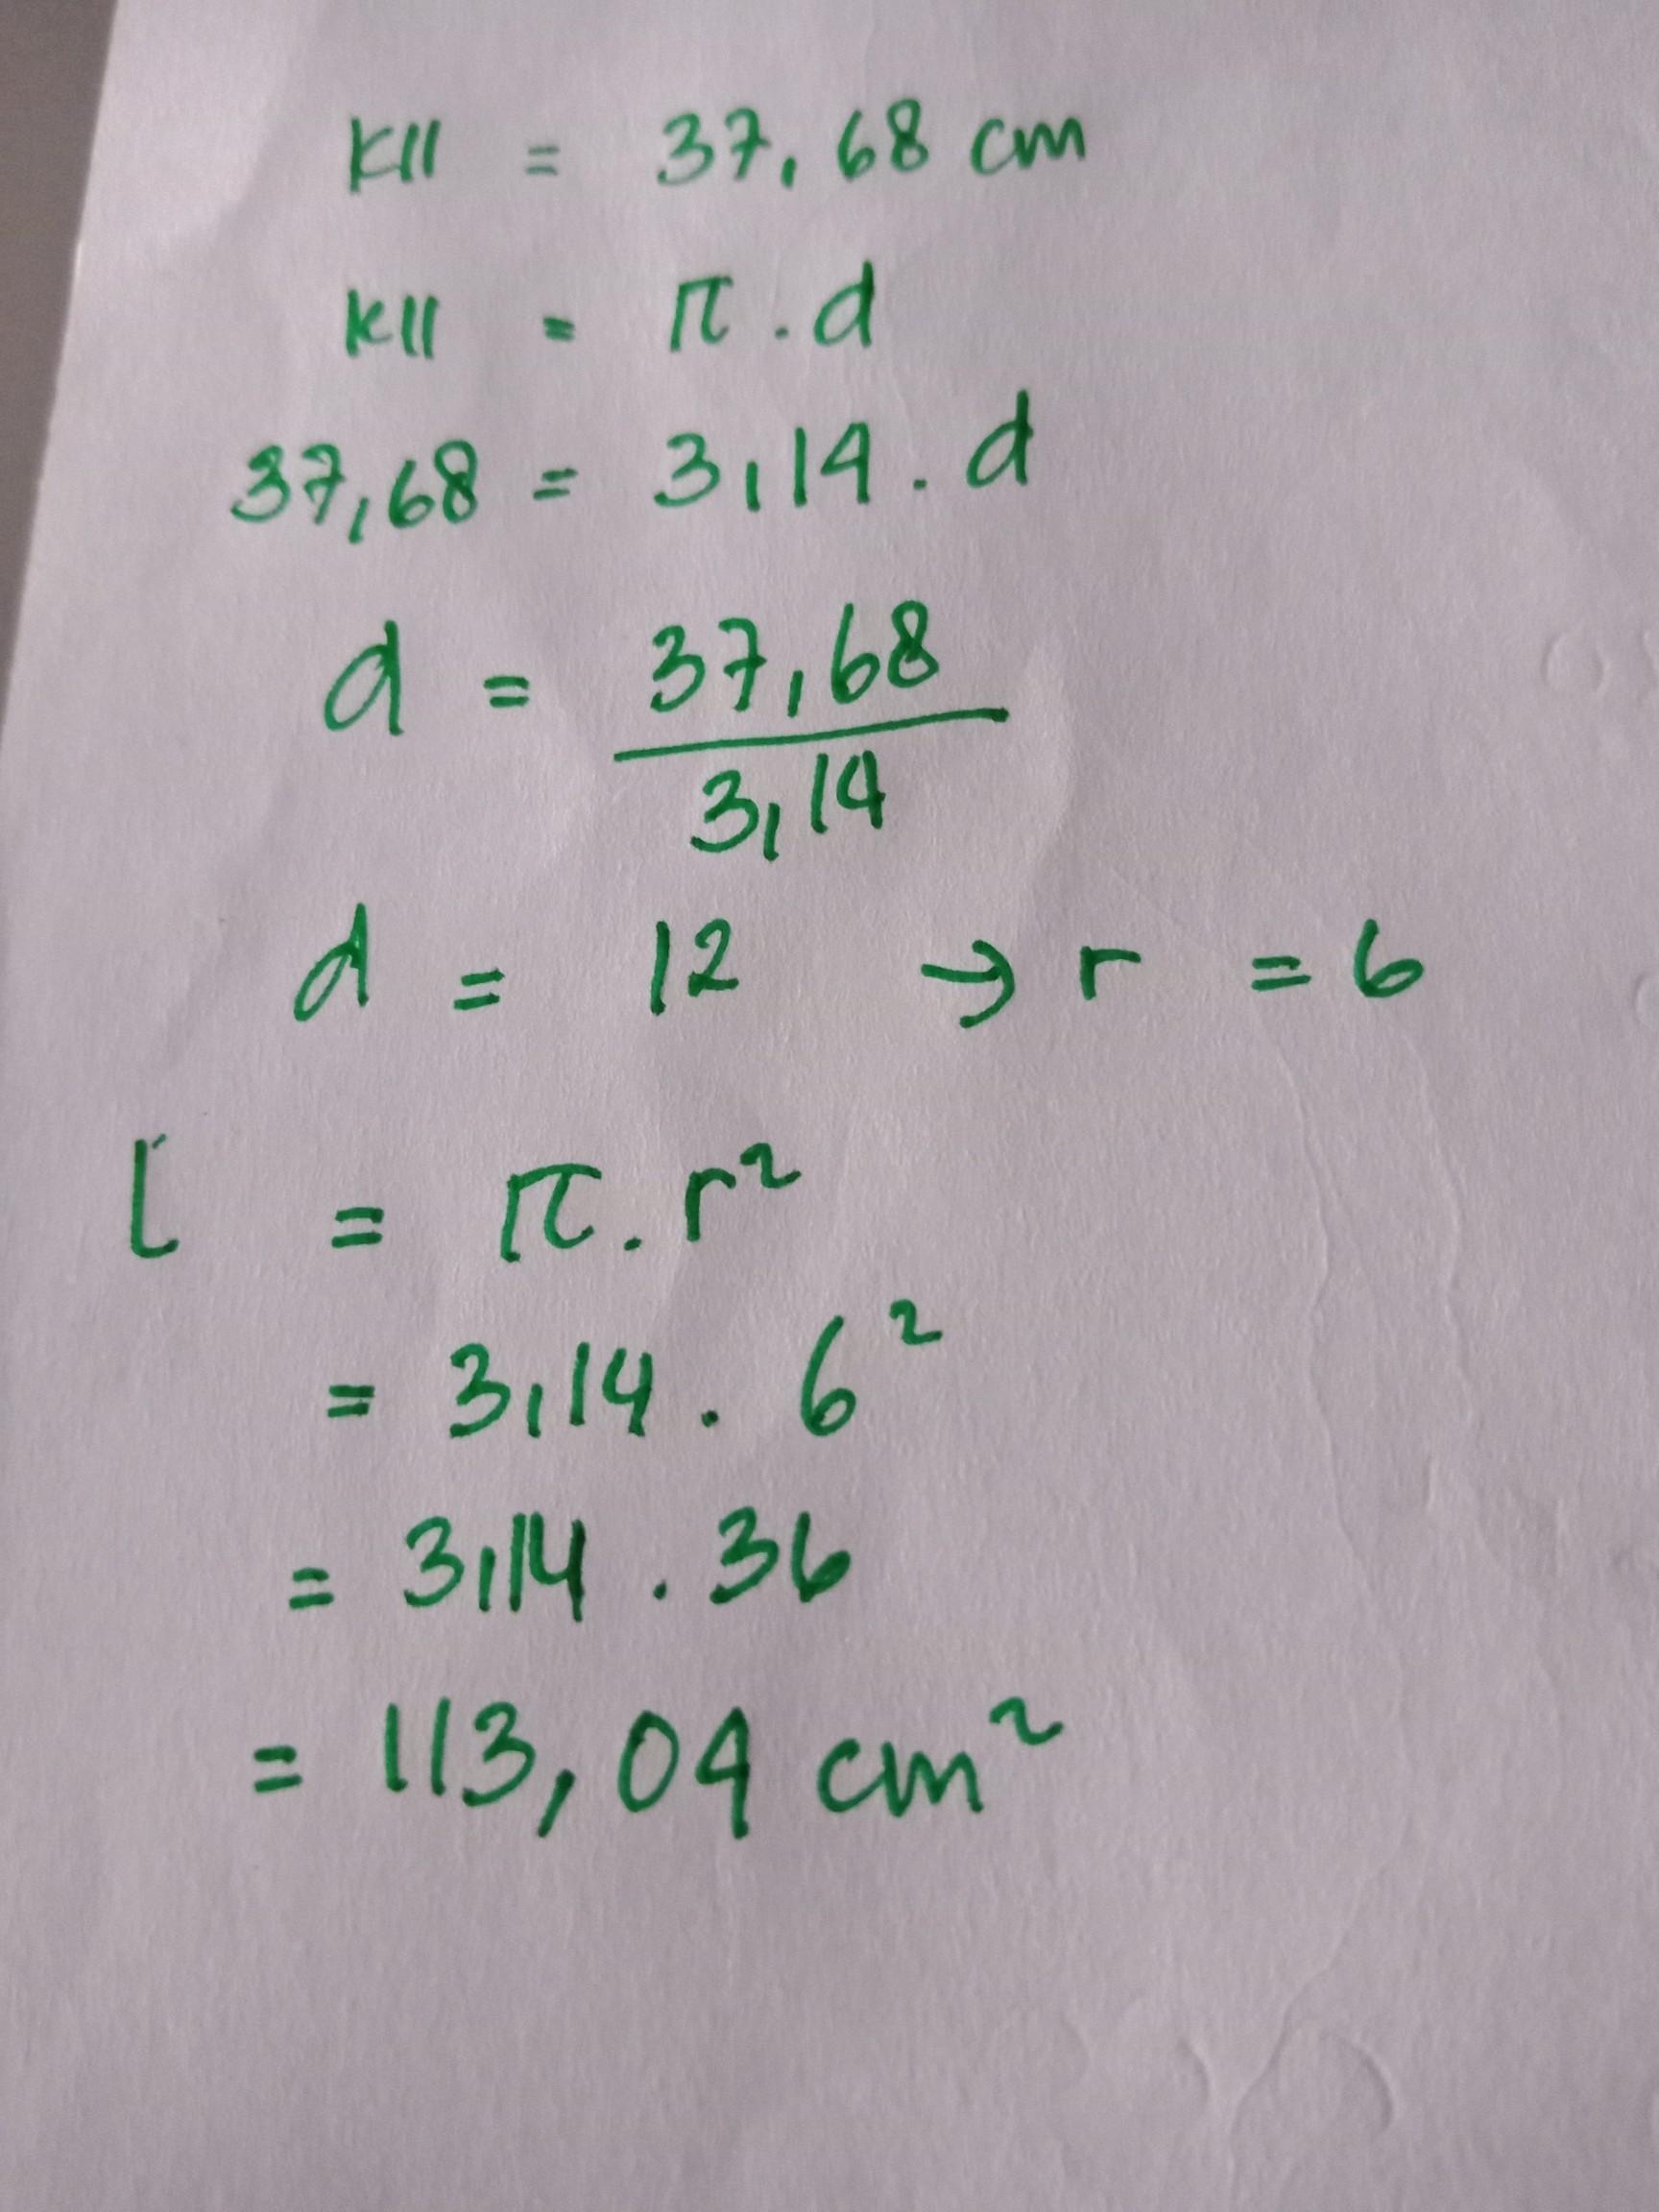 Keliling suatu lingkaran 37,68cm. Jika pi = 3,14 maka luas ...